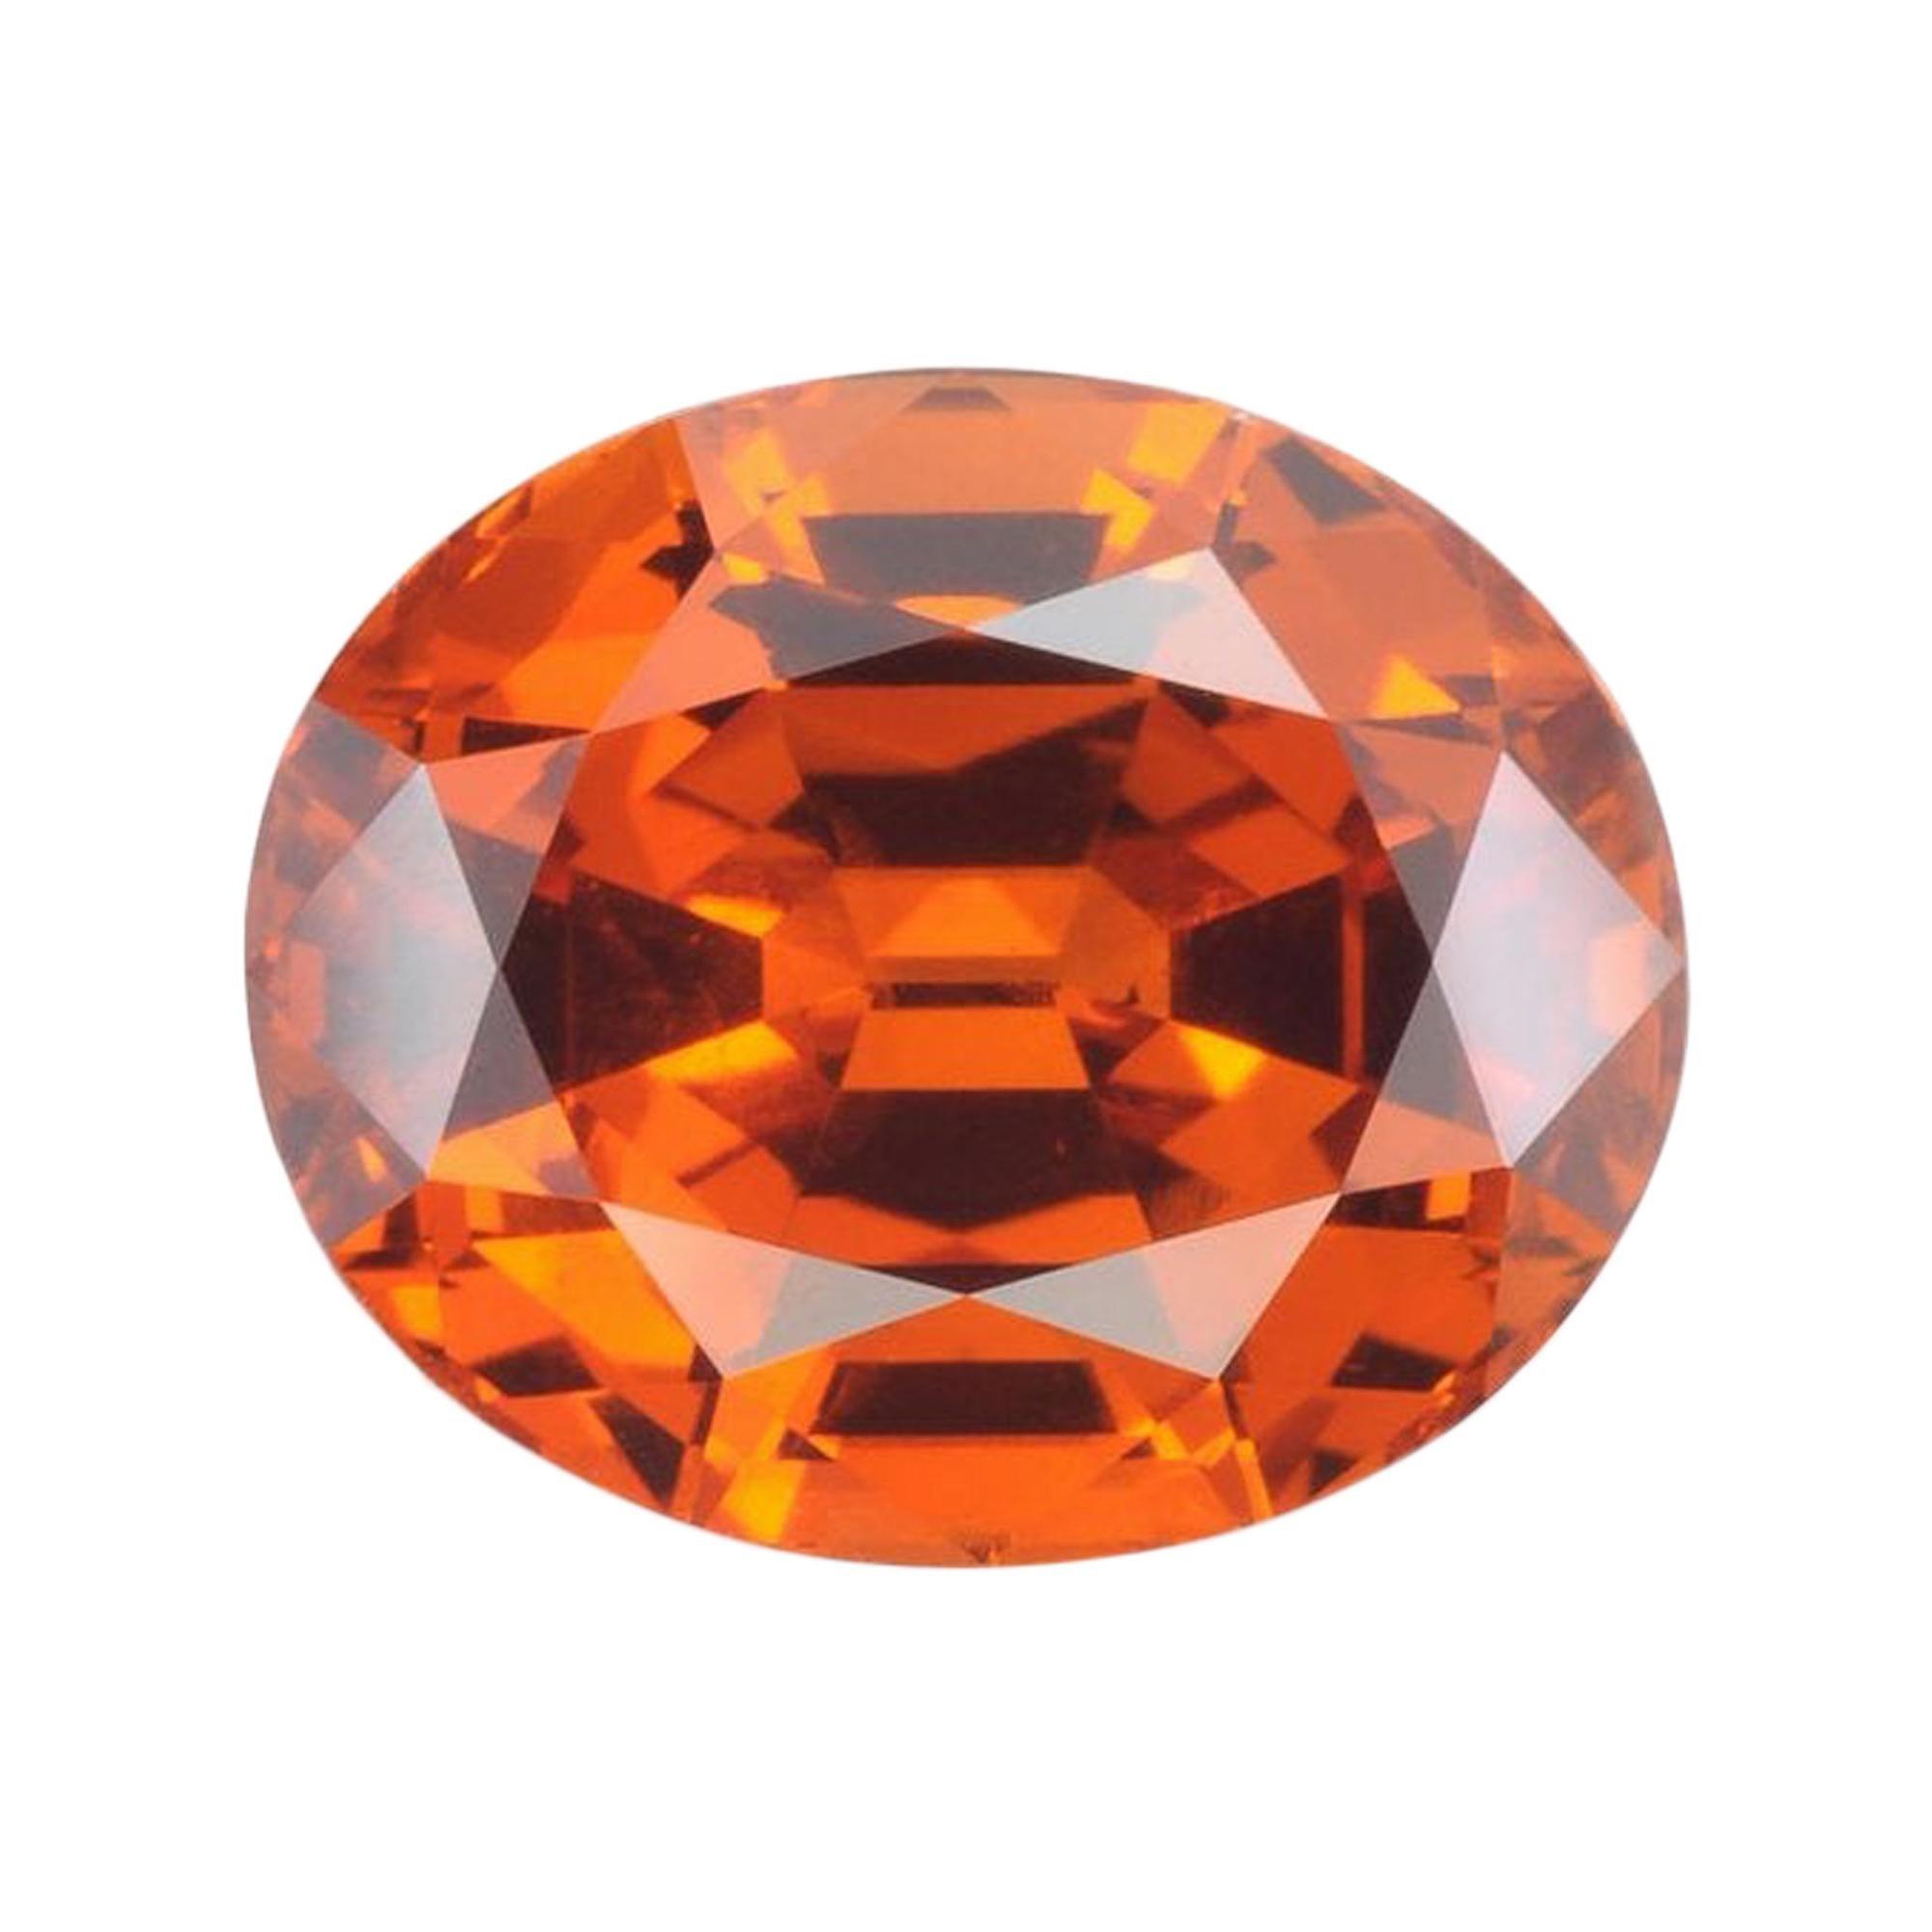 Mandarin Garnet Ring Gem 4.92 Carat Oval Loose Gemstone